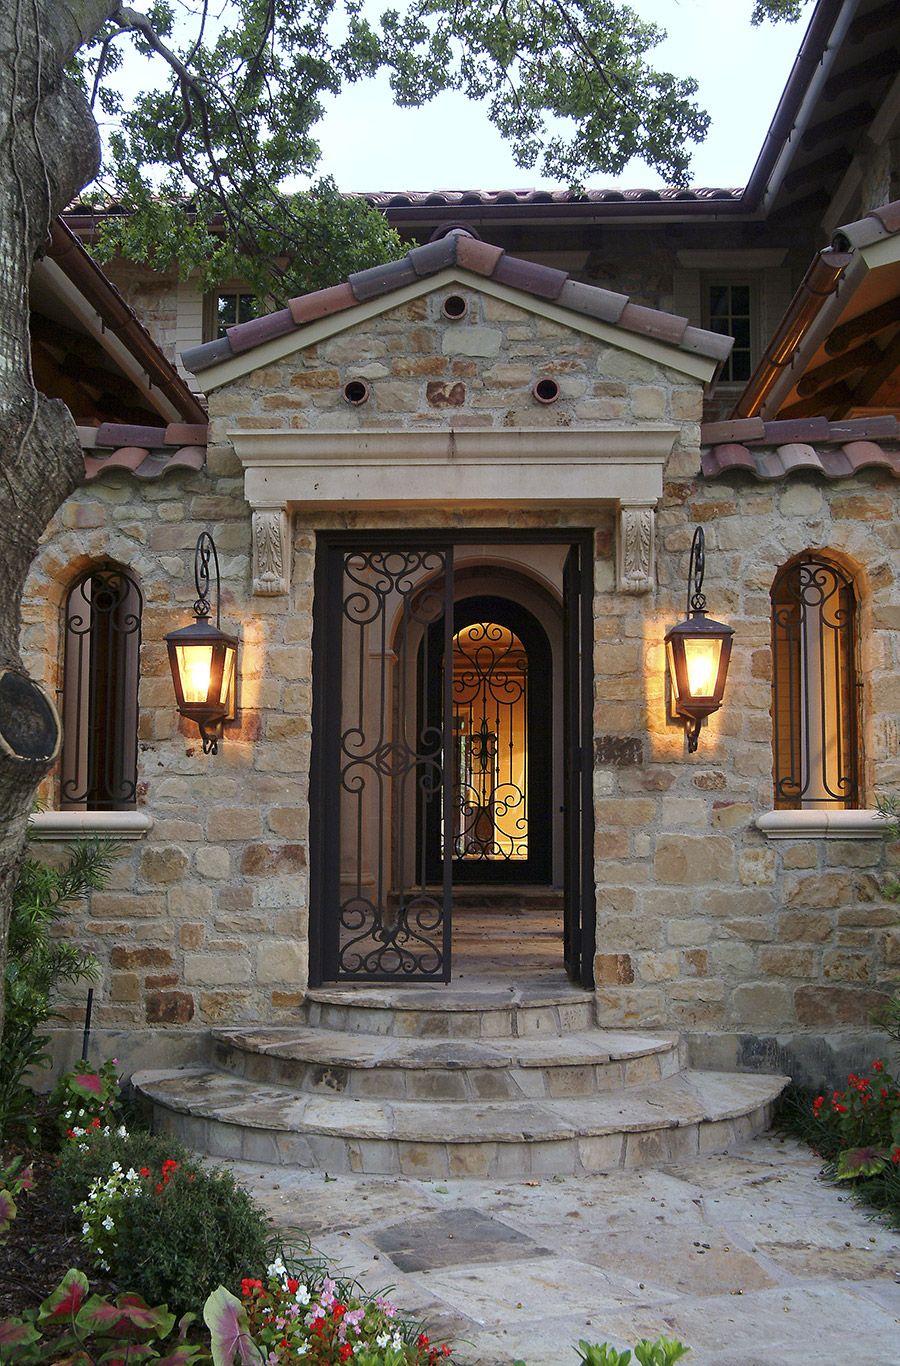 Venice-iron-lighting-fixture-foyer-hall-pendant-entry-kitchen-wrought-iron-door-solara-ligthing-C003-013-EG-(14)